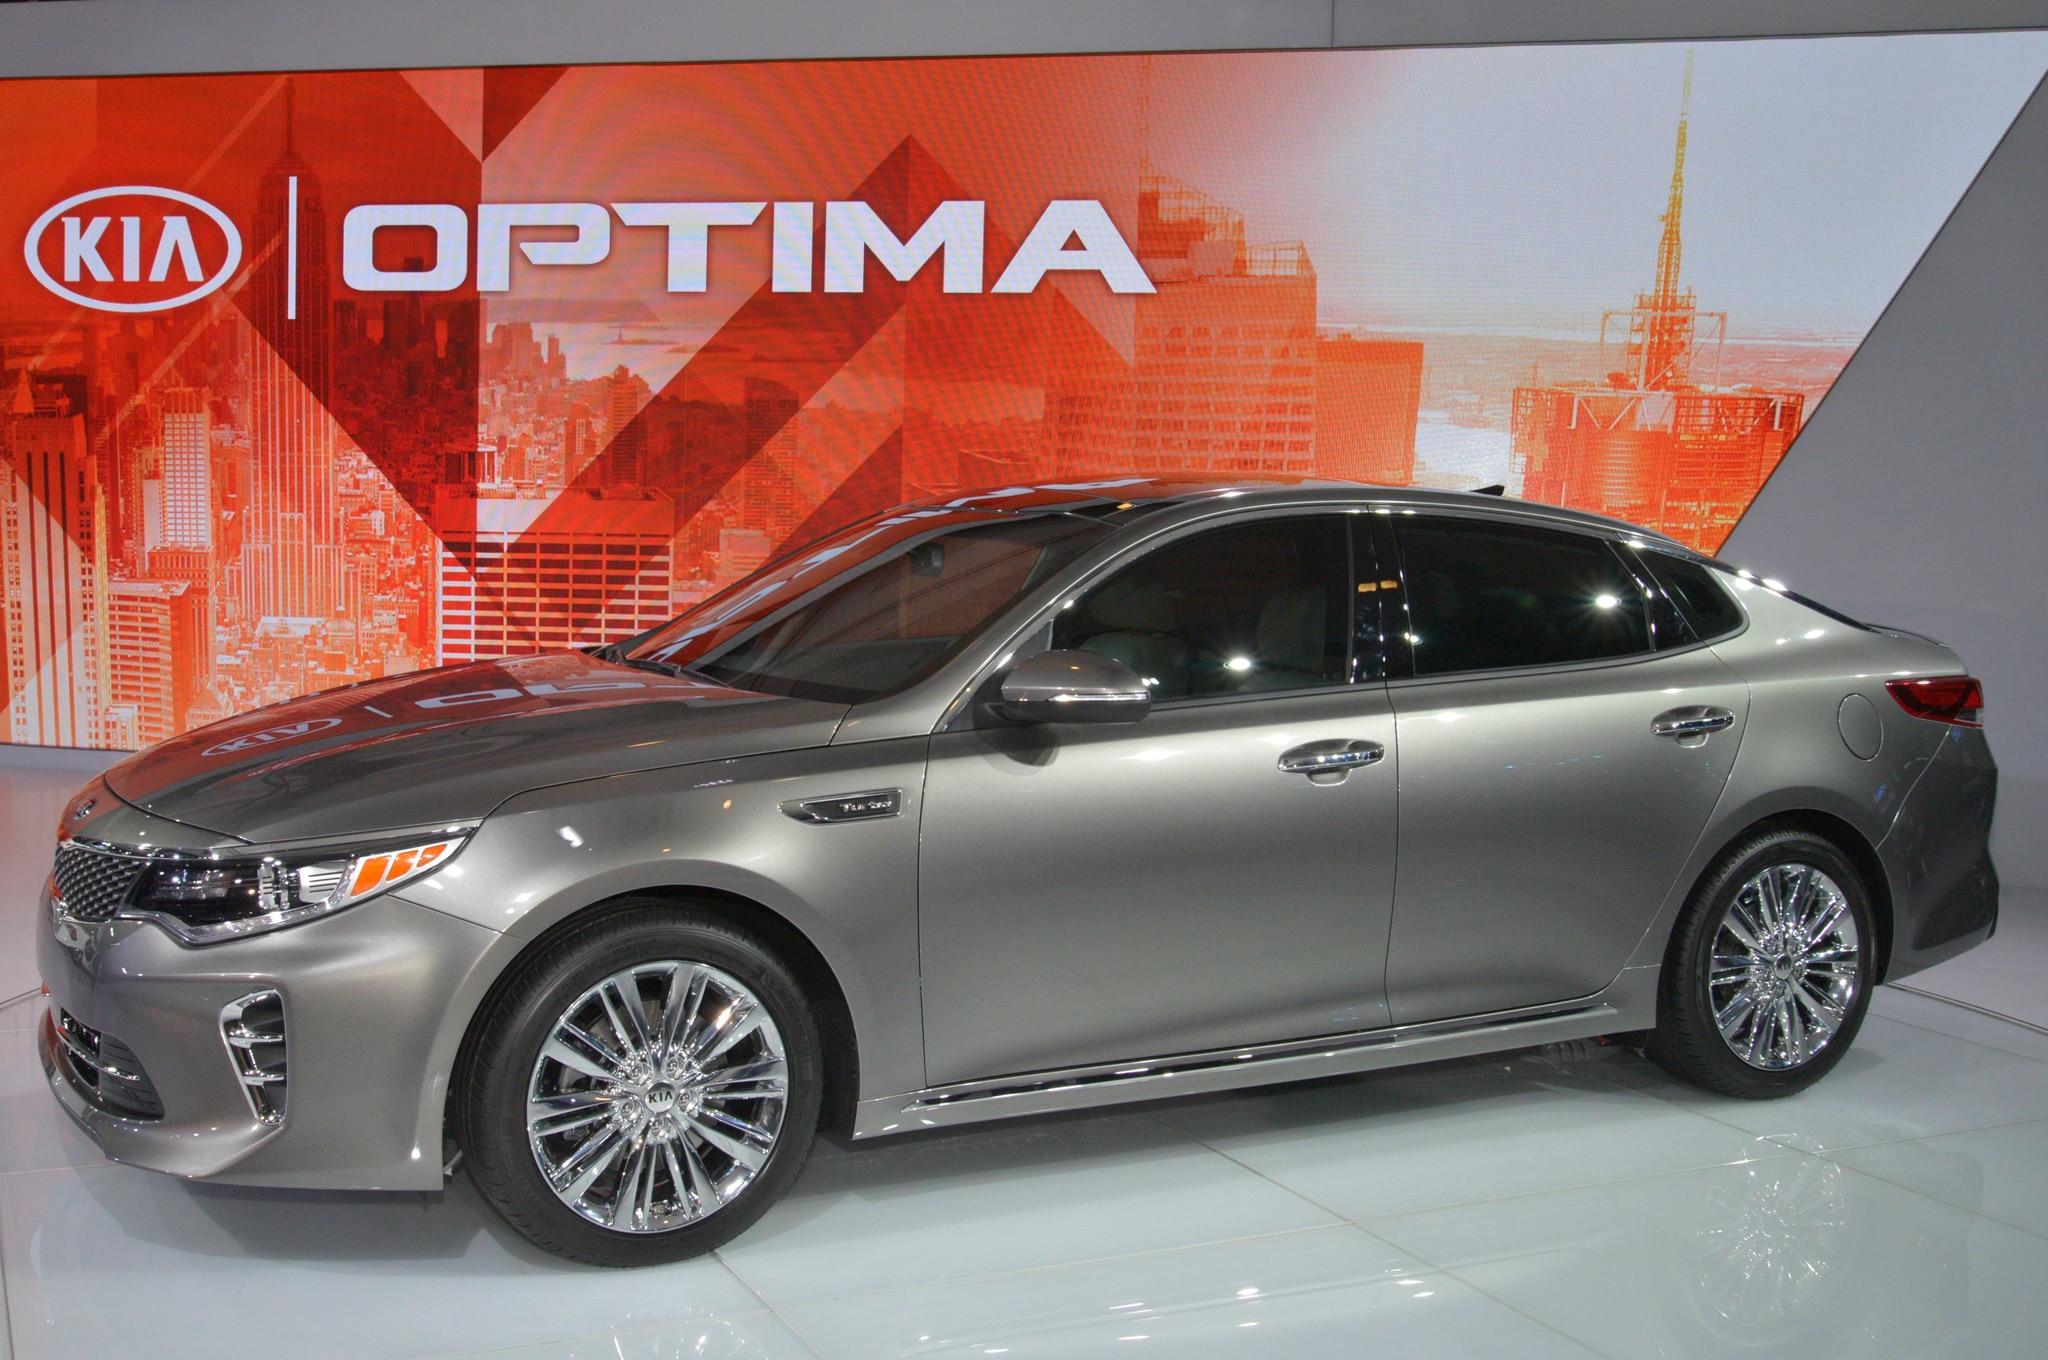 2016 Kia Optima Front Three Quarter